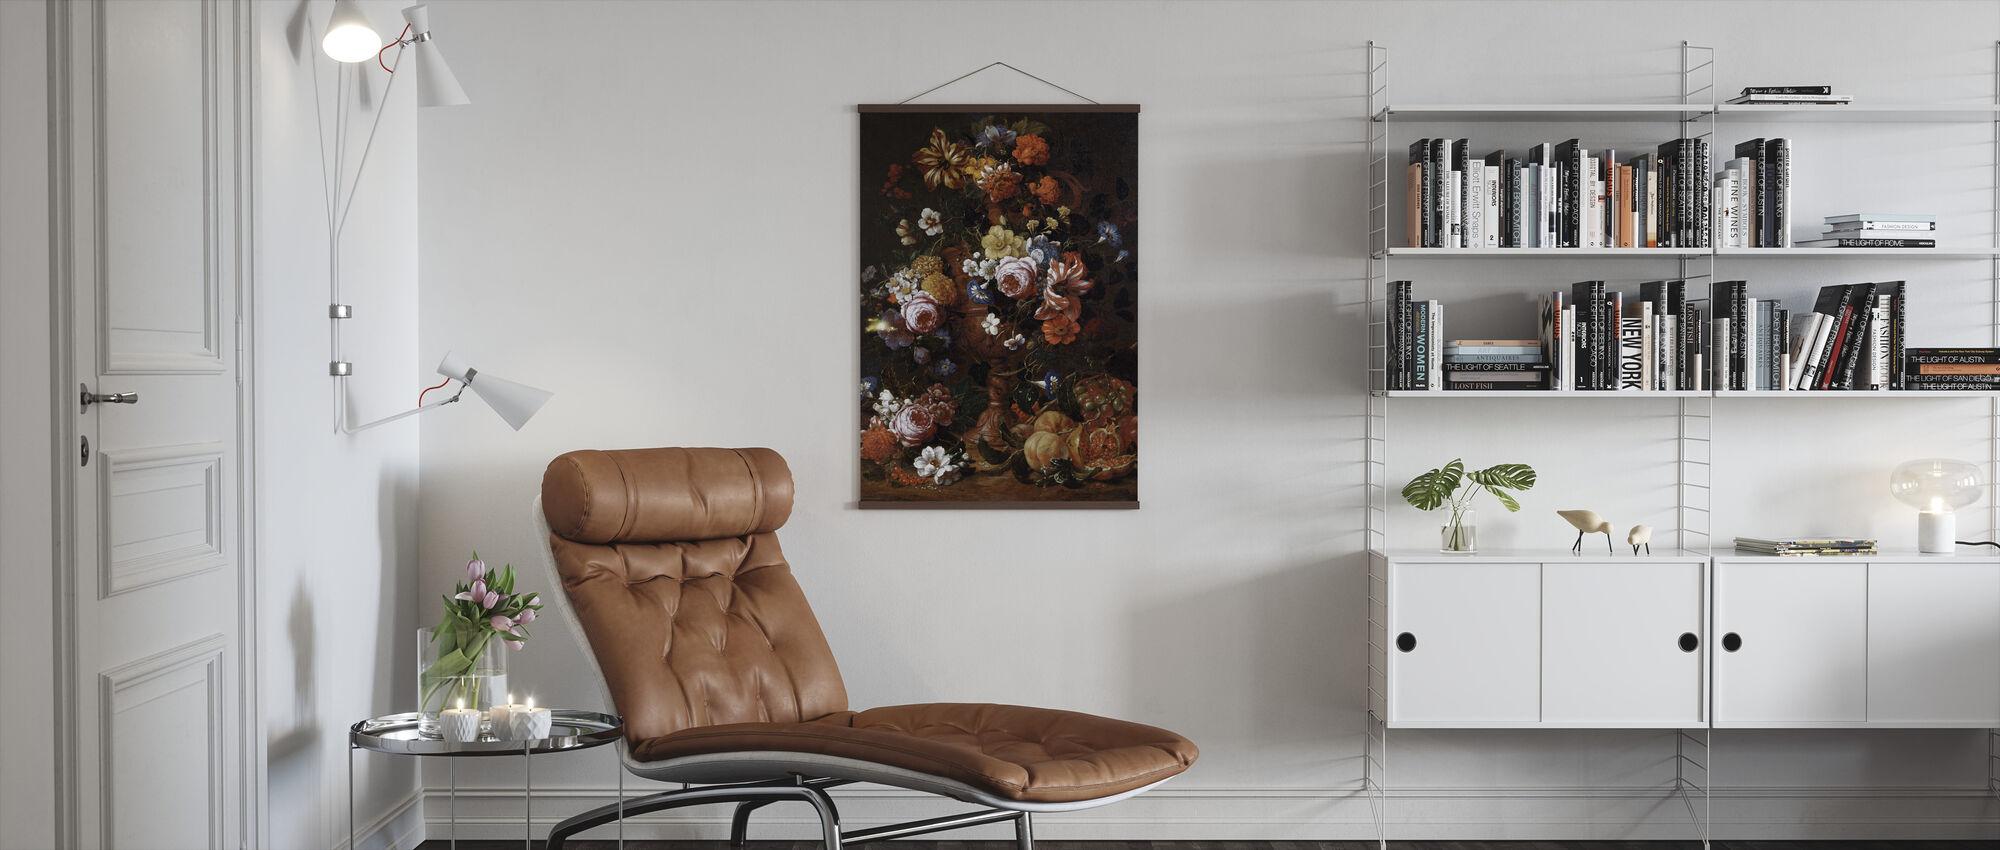 Urn van Bloemen - Nicolas van Veerendael - Poster - Woonkamer